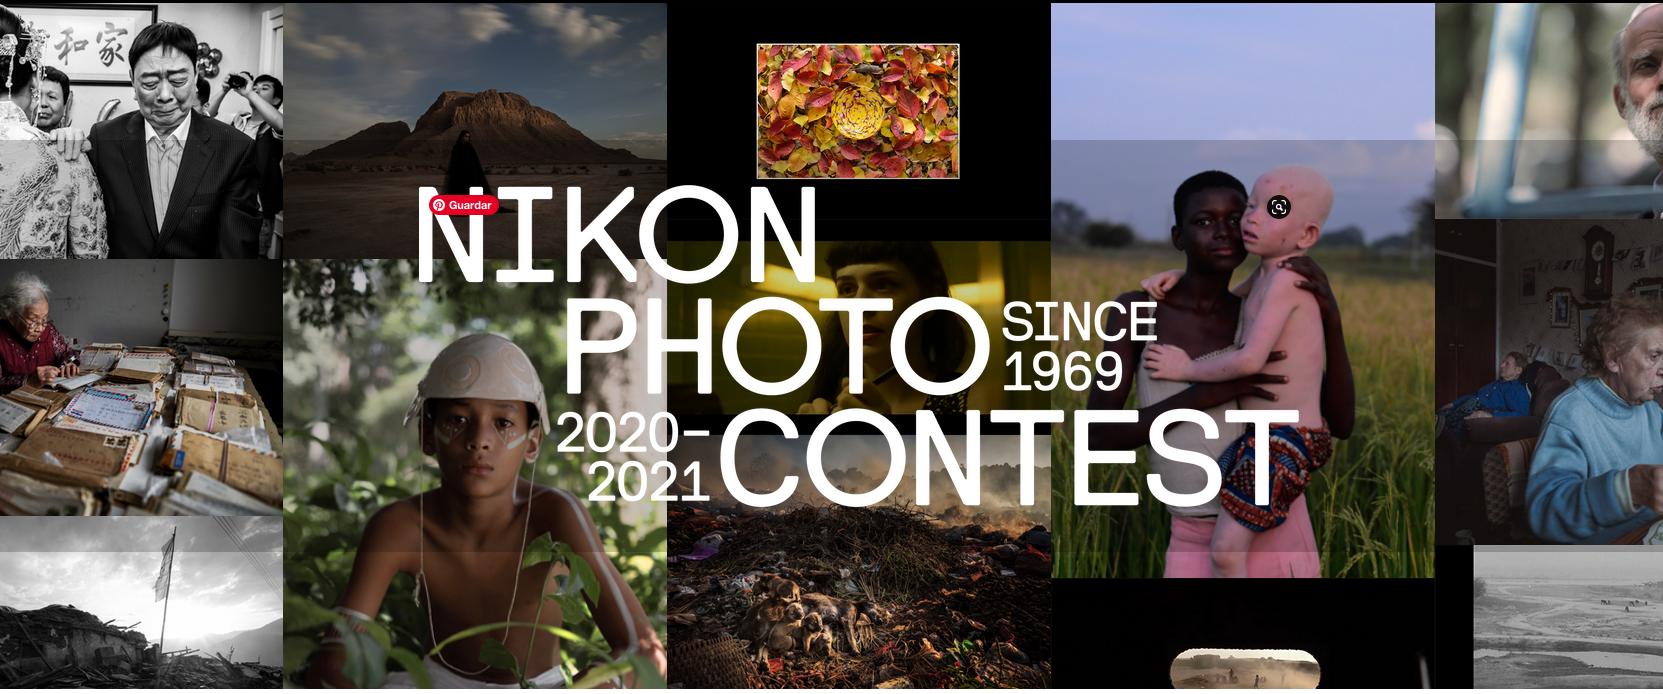 Nikon Photocontest Concurso 2021